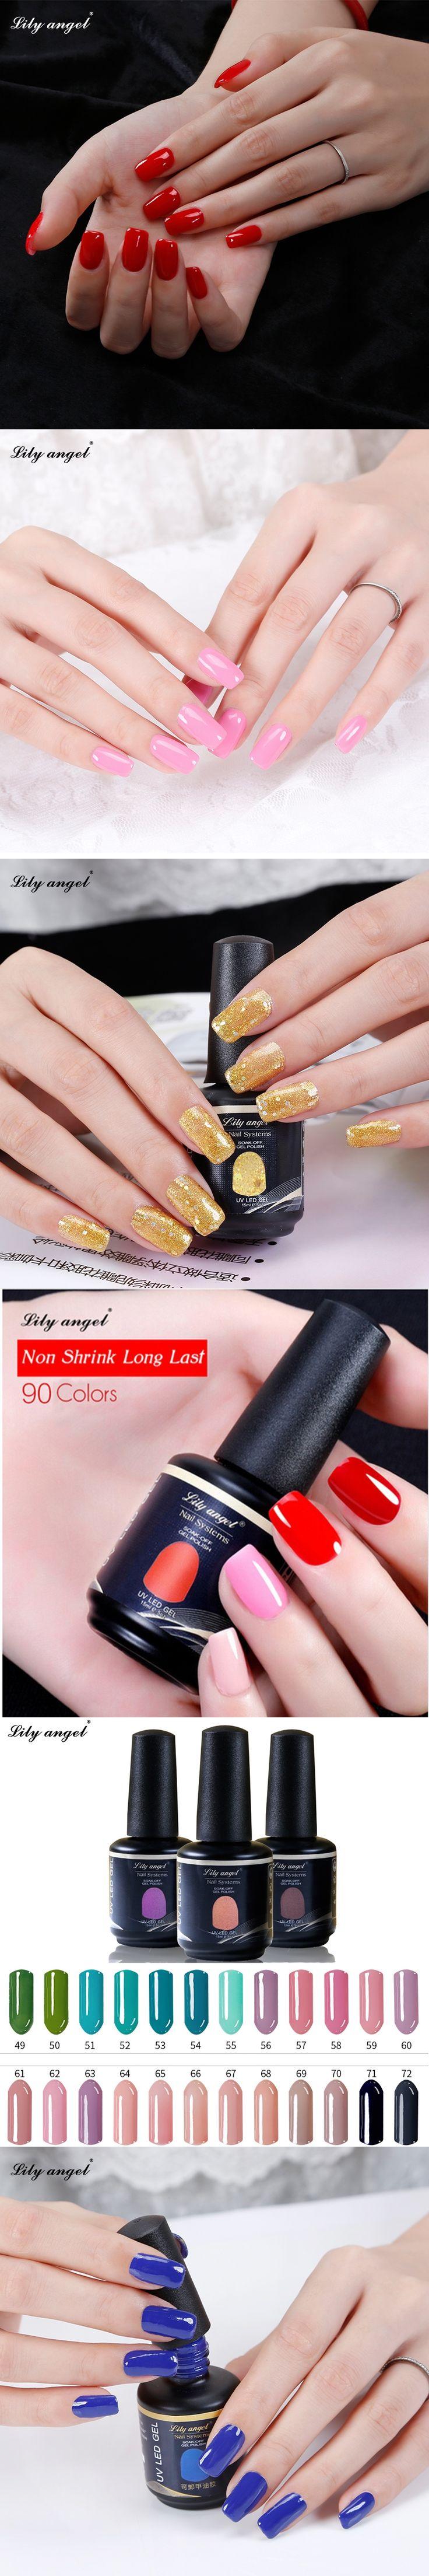 Lily angel 15ml 90 Gorgeous Colors Available UV Lamp Soak Off UV Gel Nail Polish Vernish Semi Permanent Gel Polish NO.49-72